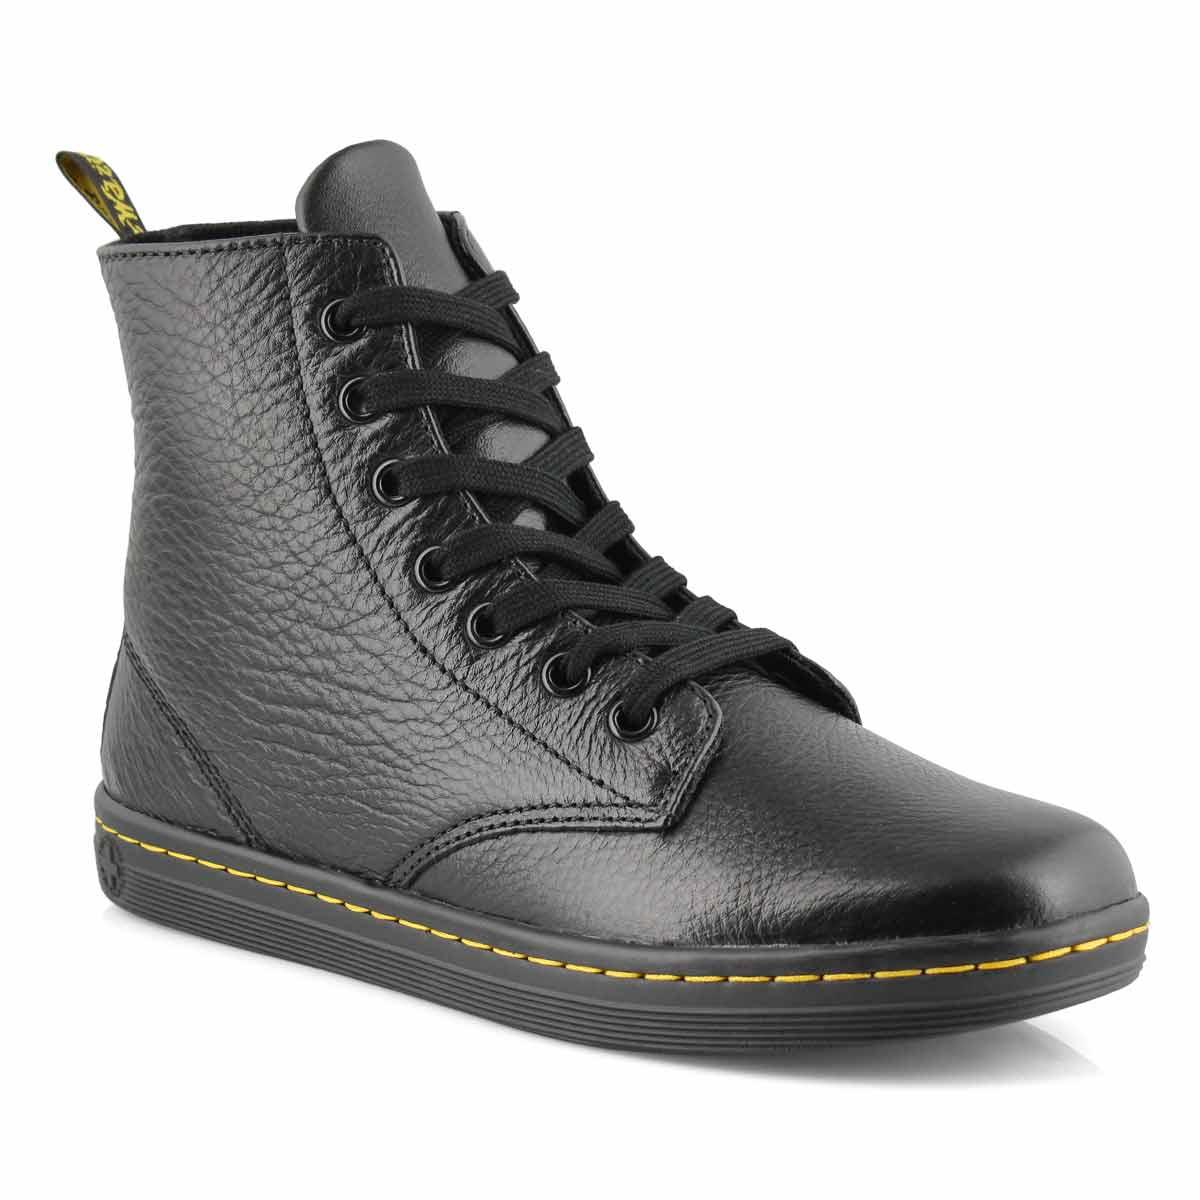 Women's LEYTON black ankle booties